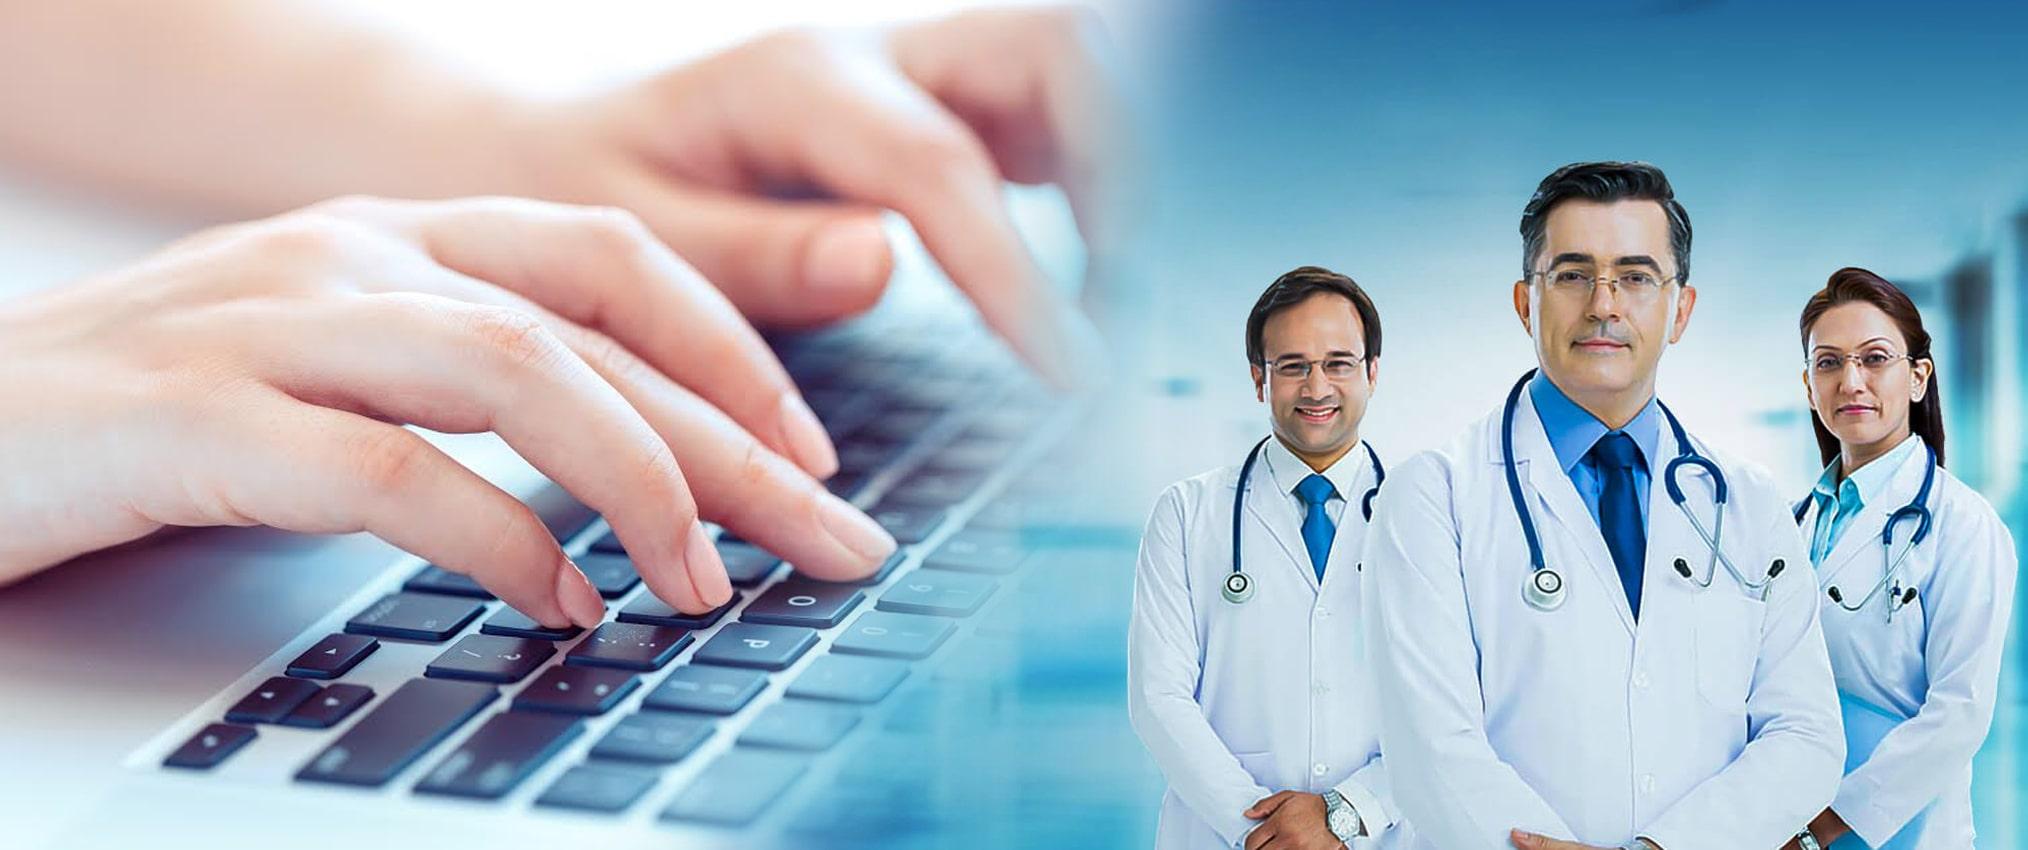 healthcare bpo hospitals rcm